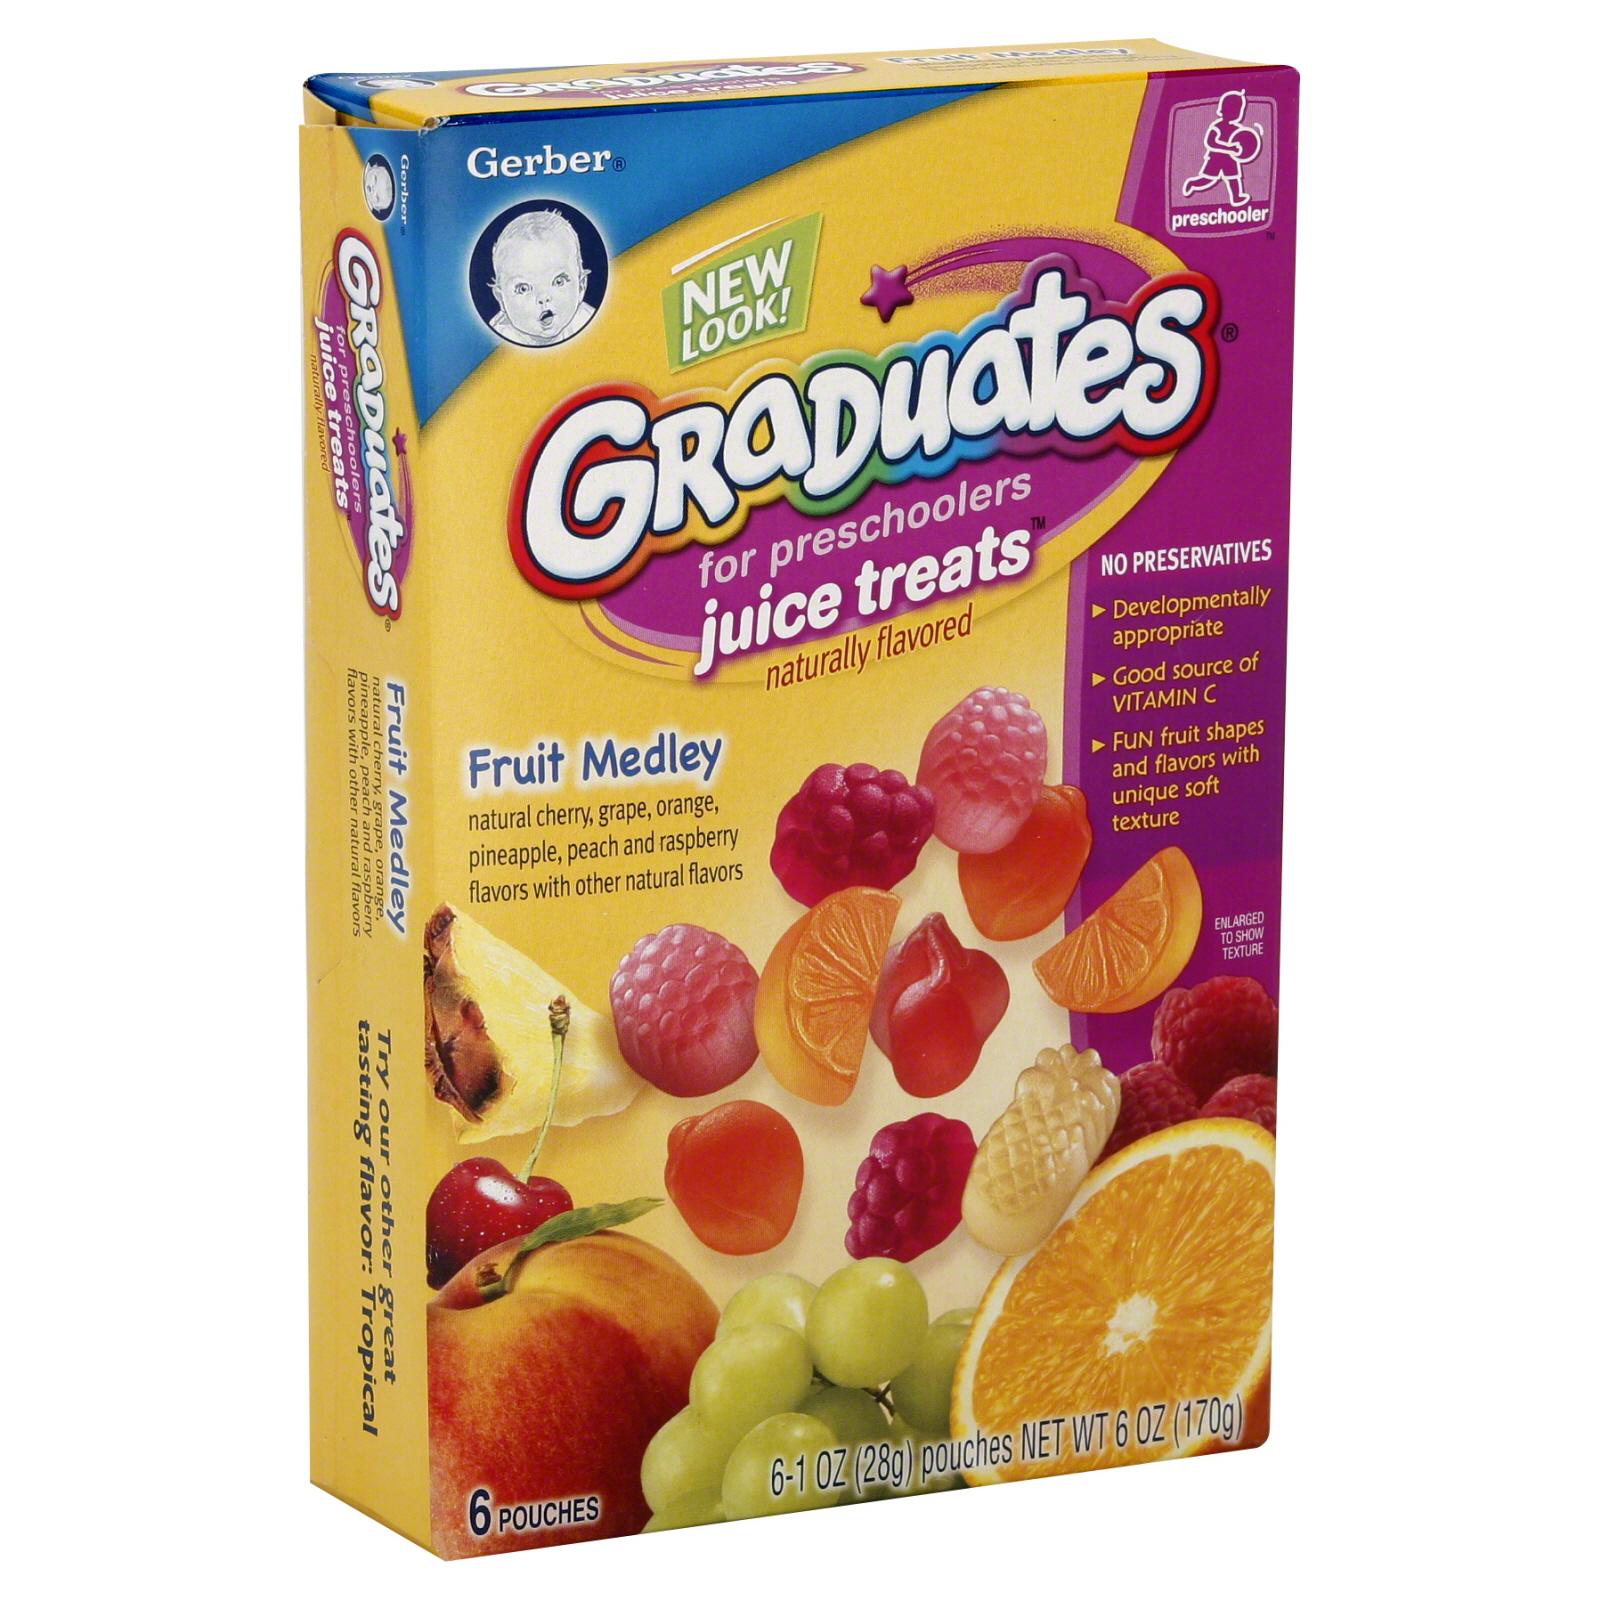 More On Developmentally Appropriate >> Gerber Graduates Juice Treats For Preschoolers Fruit Medley 6 oz